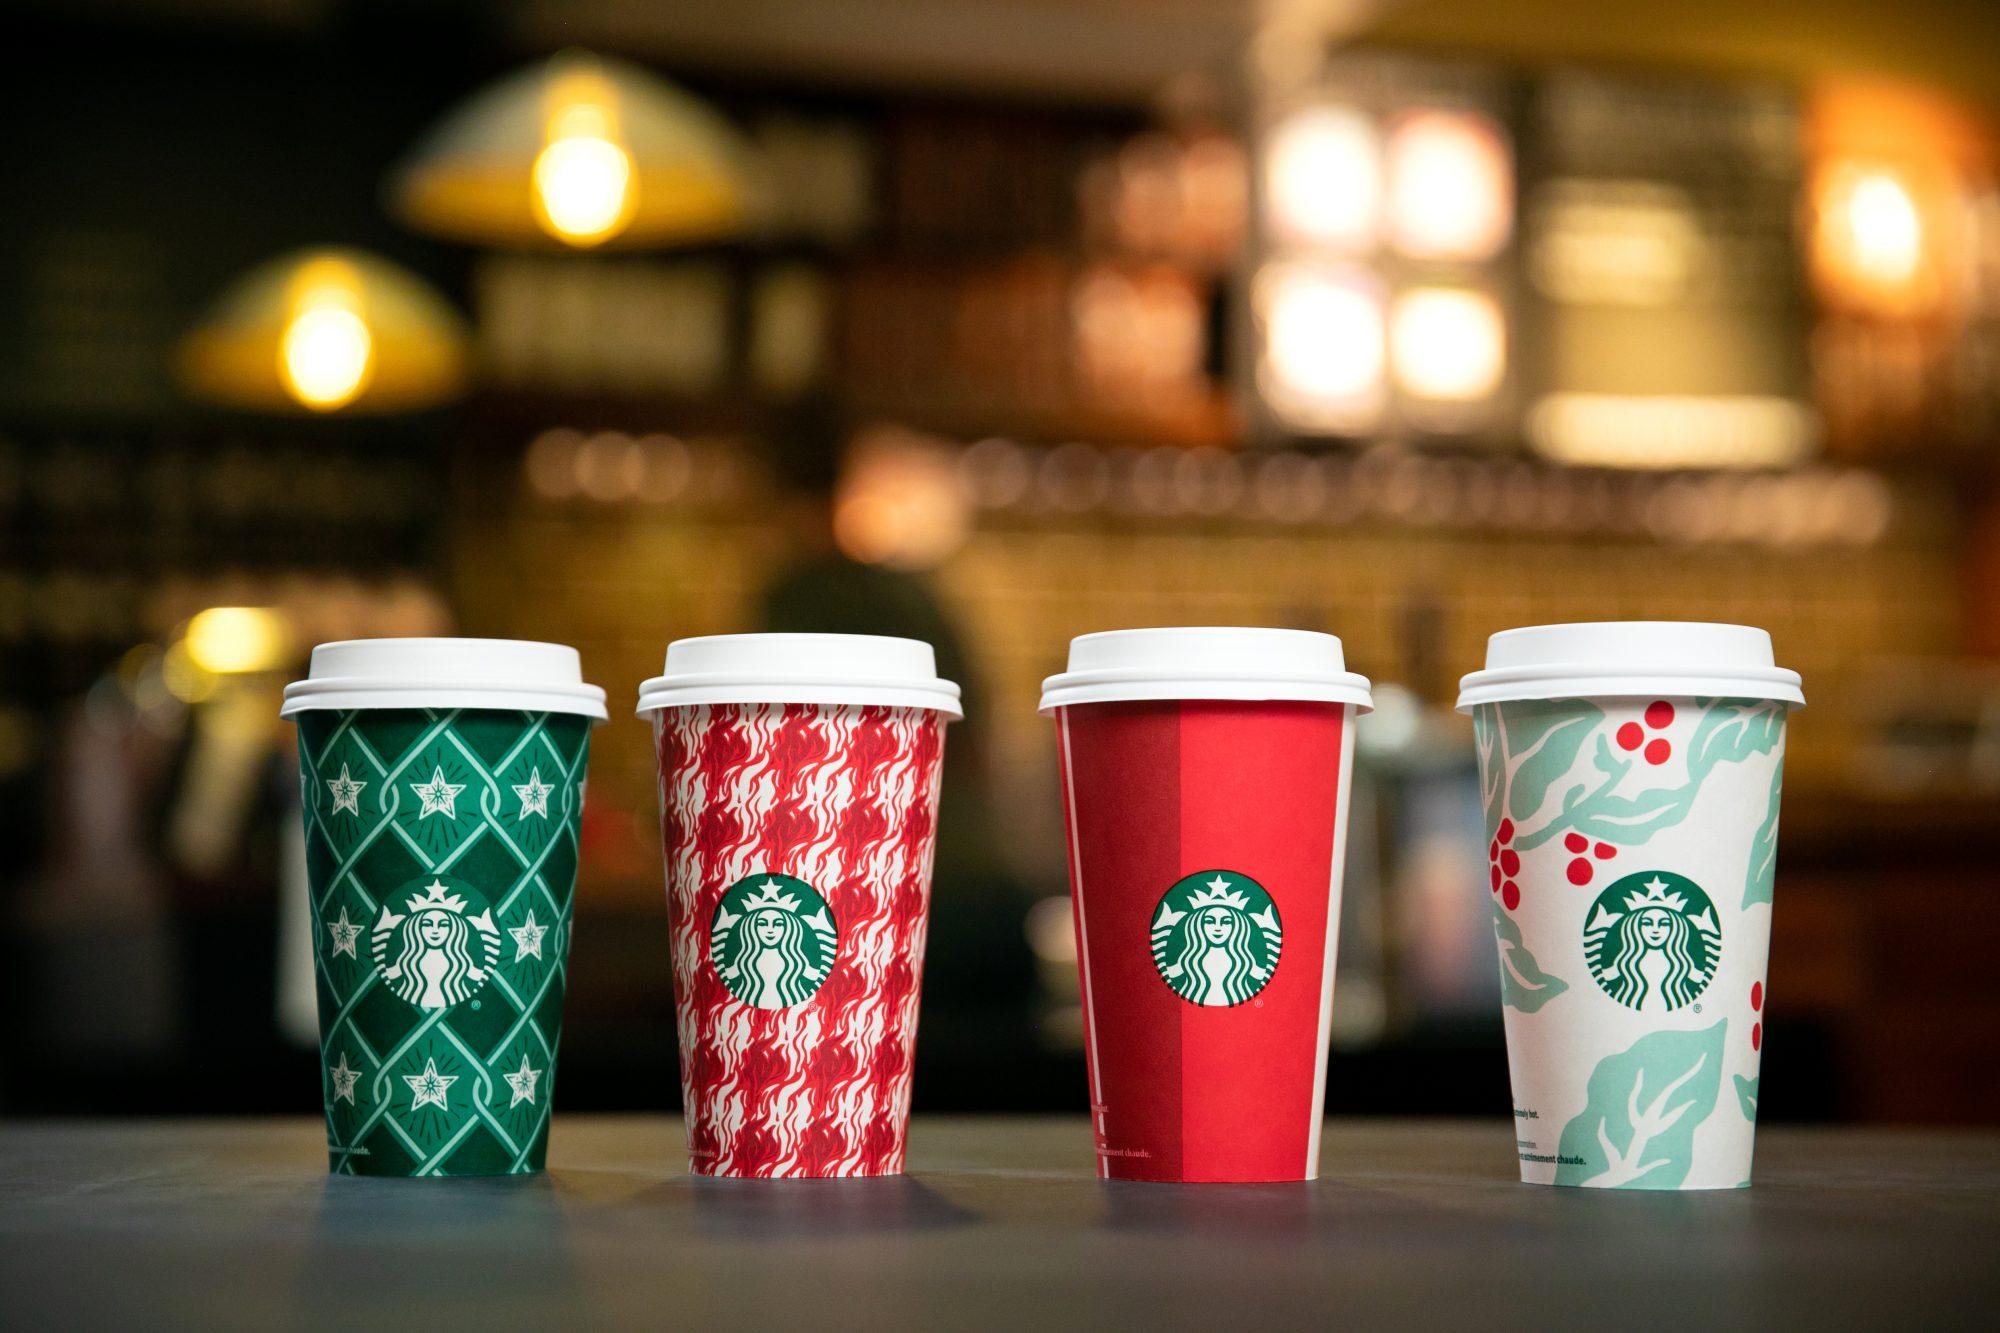 starbucks-holiday-cups.jpg